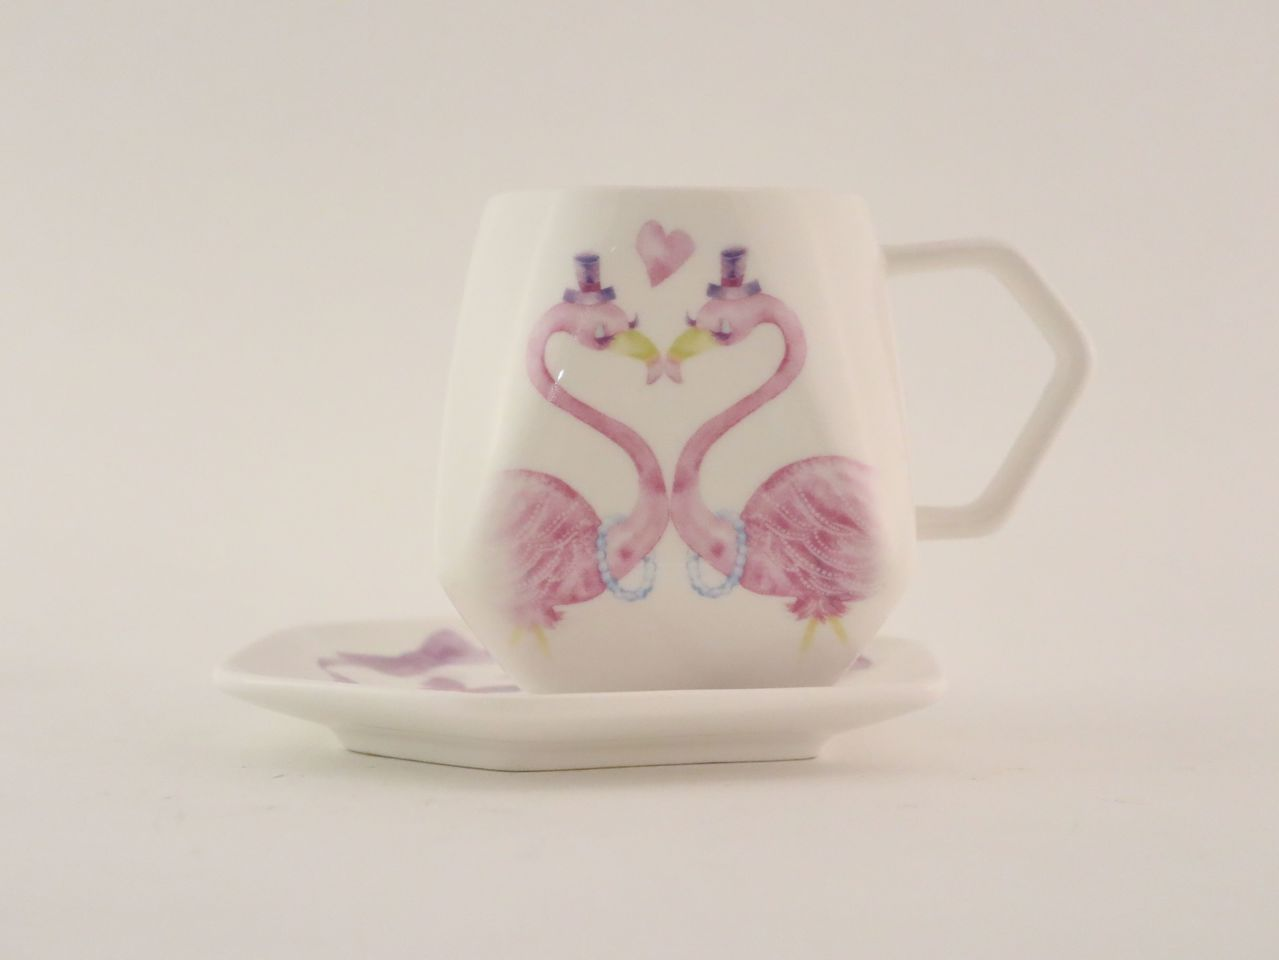 ECONECO天燈咖啡杯盤-愛情紅鶴Love flamingo。圖/日藥本舖提供